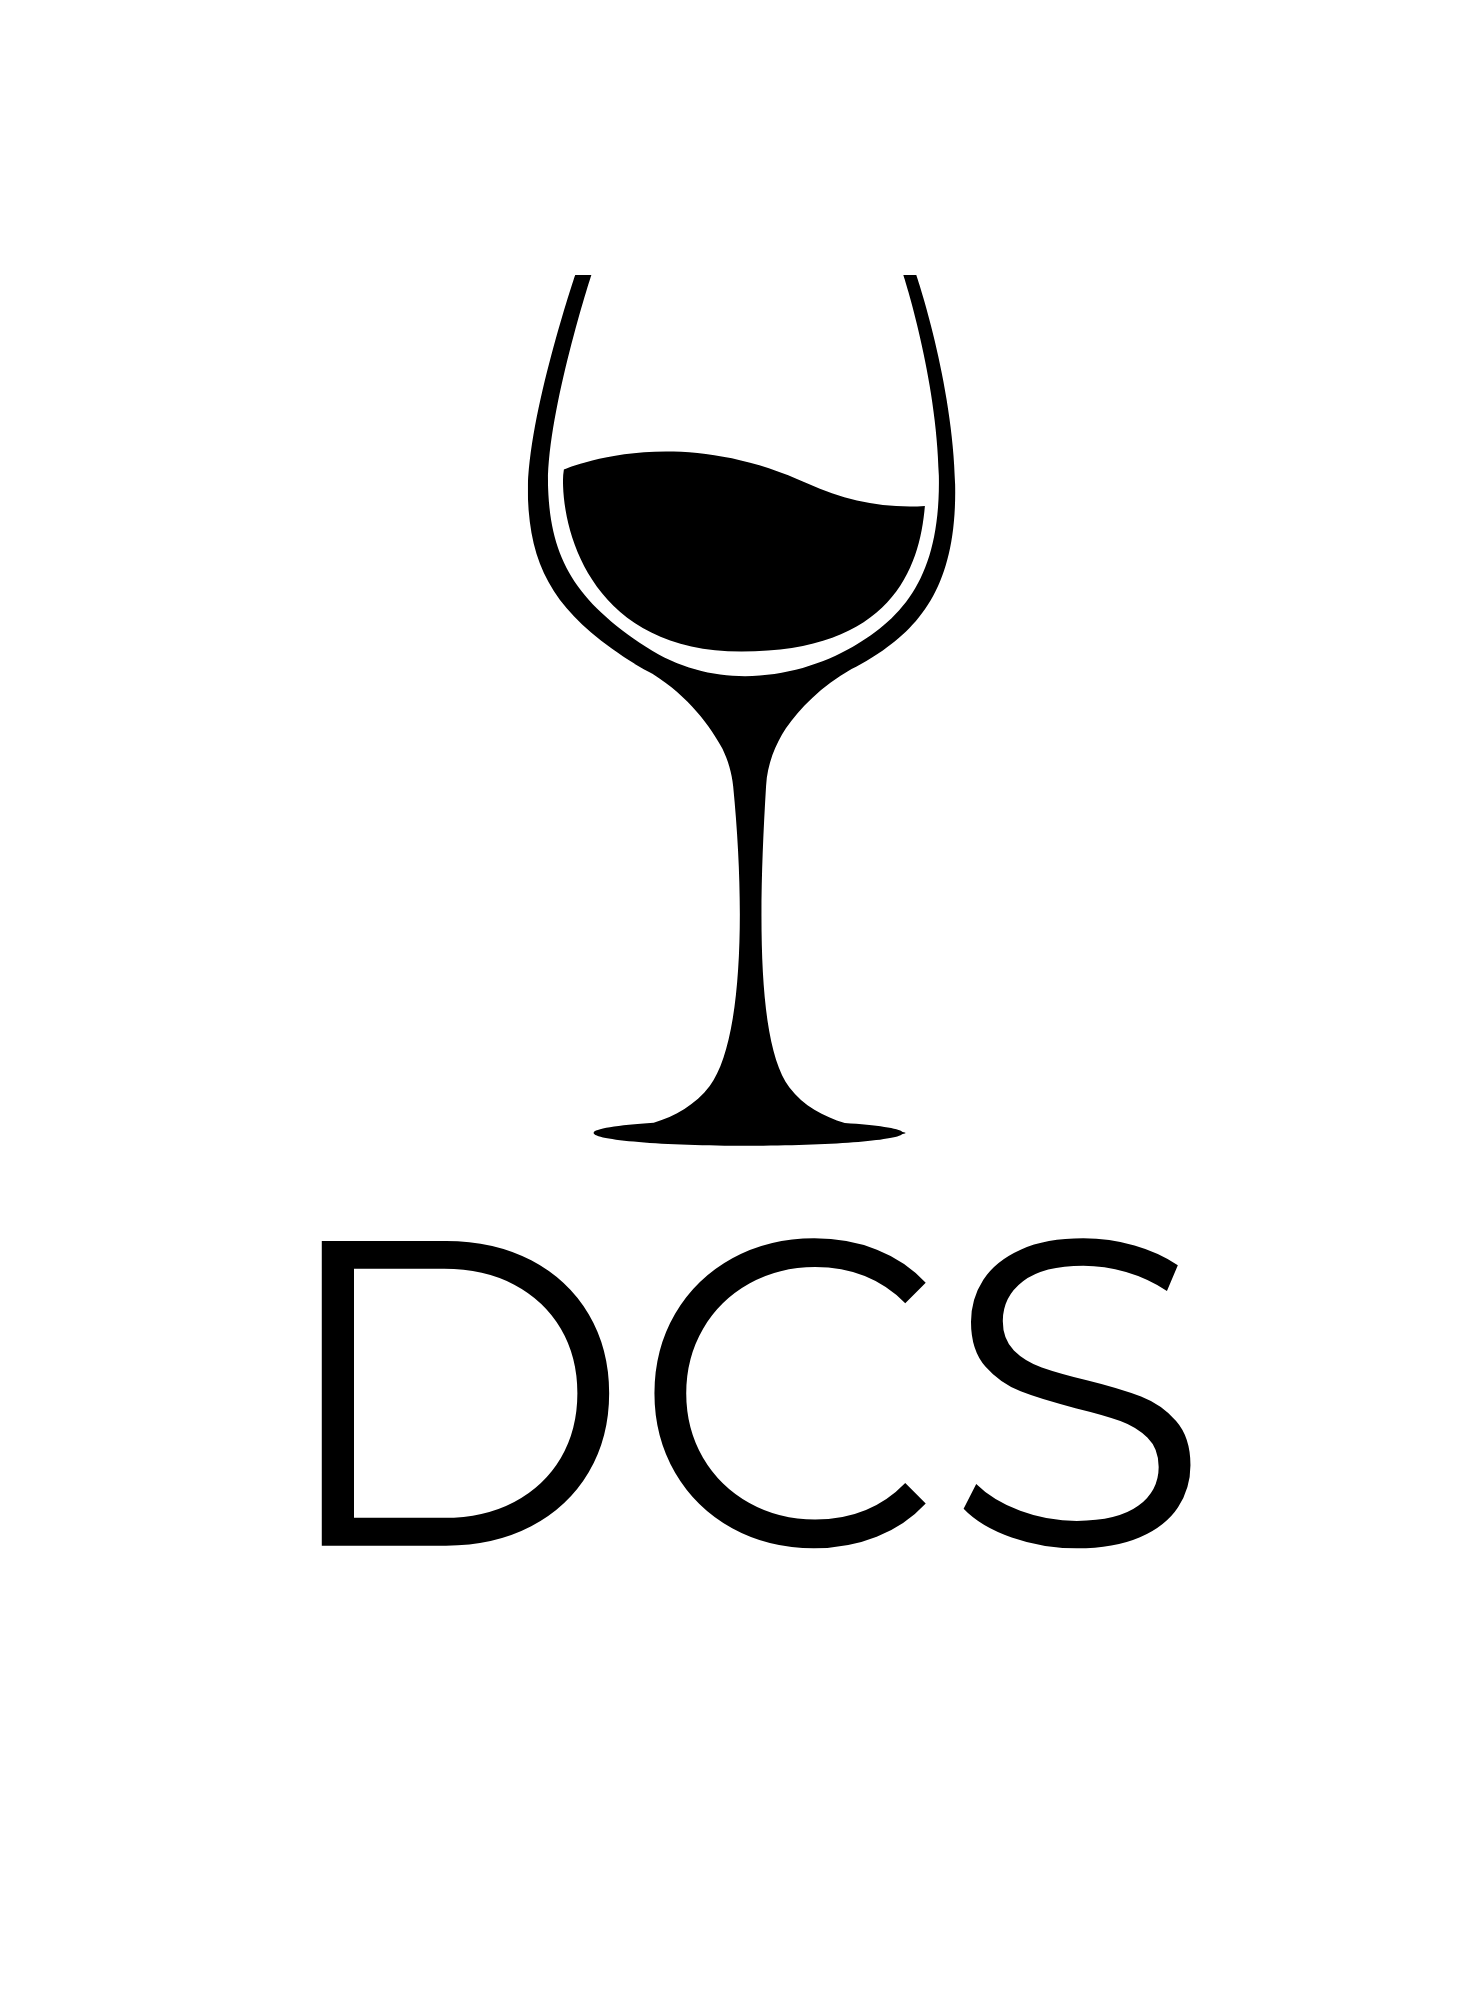 DCS-logo-black.png